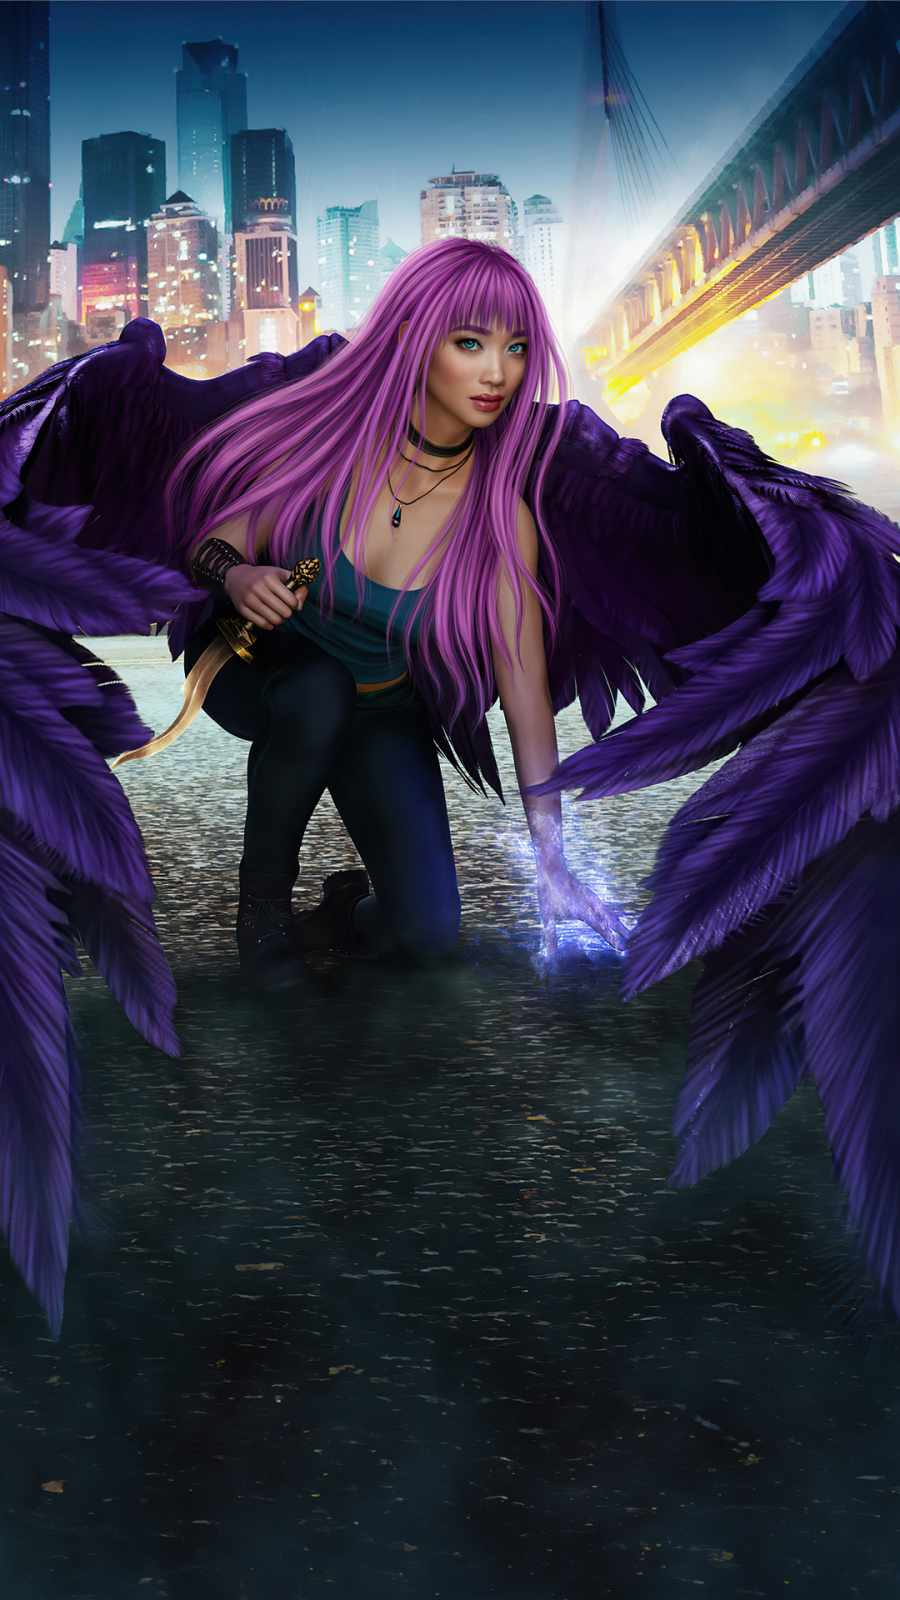 Wings of destiny iPhone Wallpaper